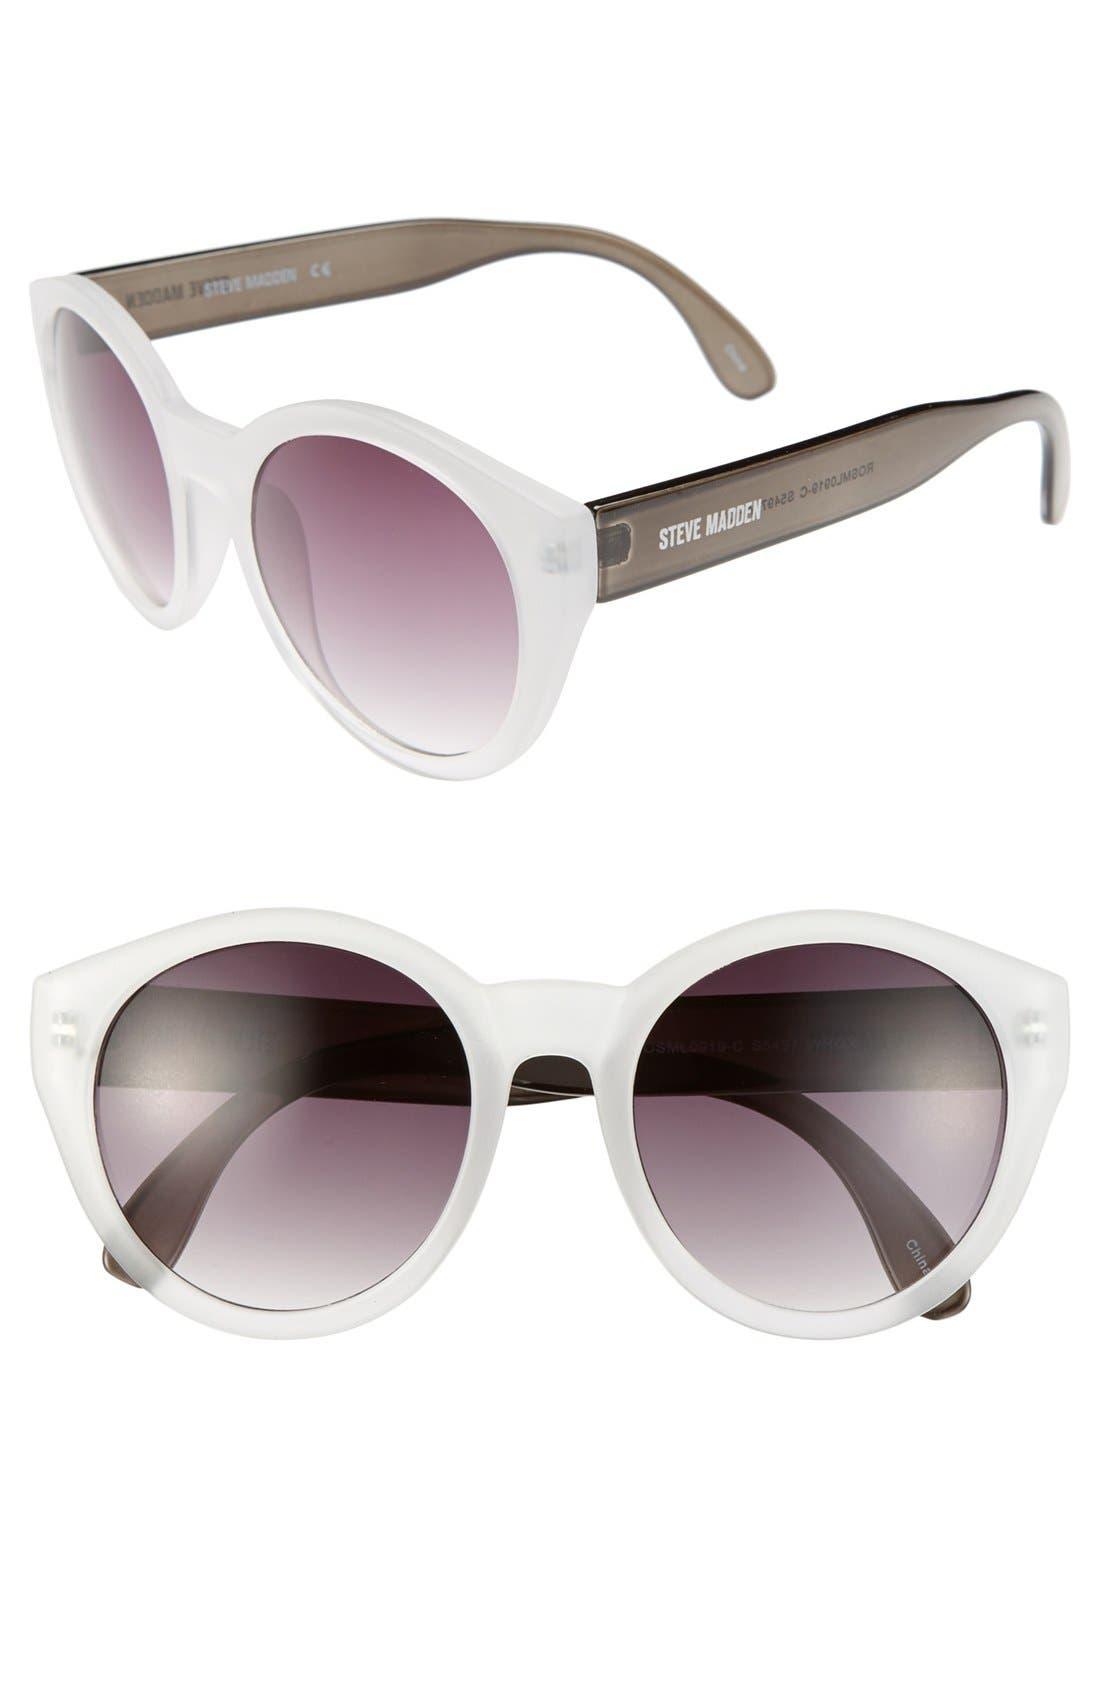 Main Image - Steve Madden 49mm Round Oversized Sunglasses